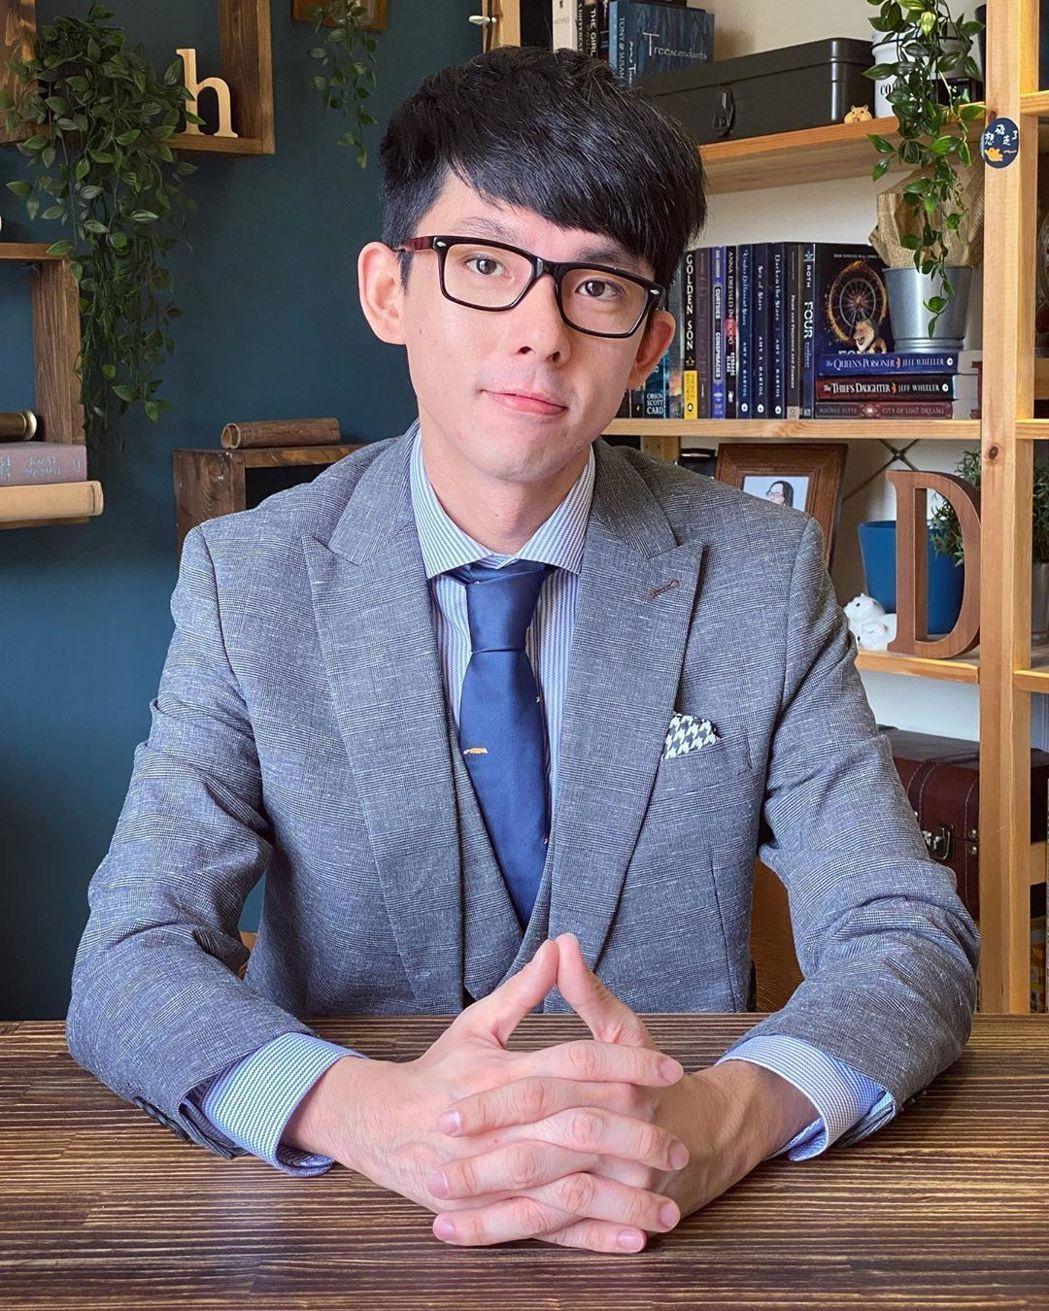 YouTuber阿滴等人發起募資,希望買下紐約時報全版廣告,刊登「台灣人寫給世界